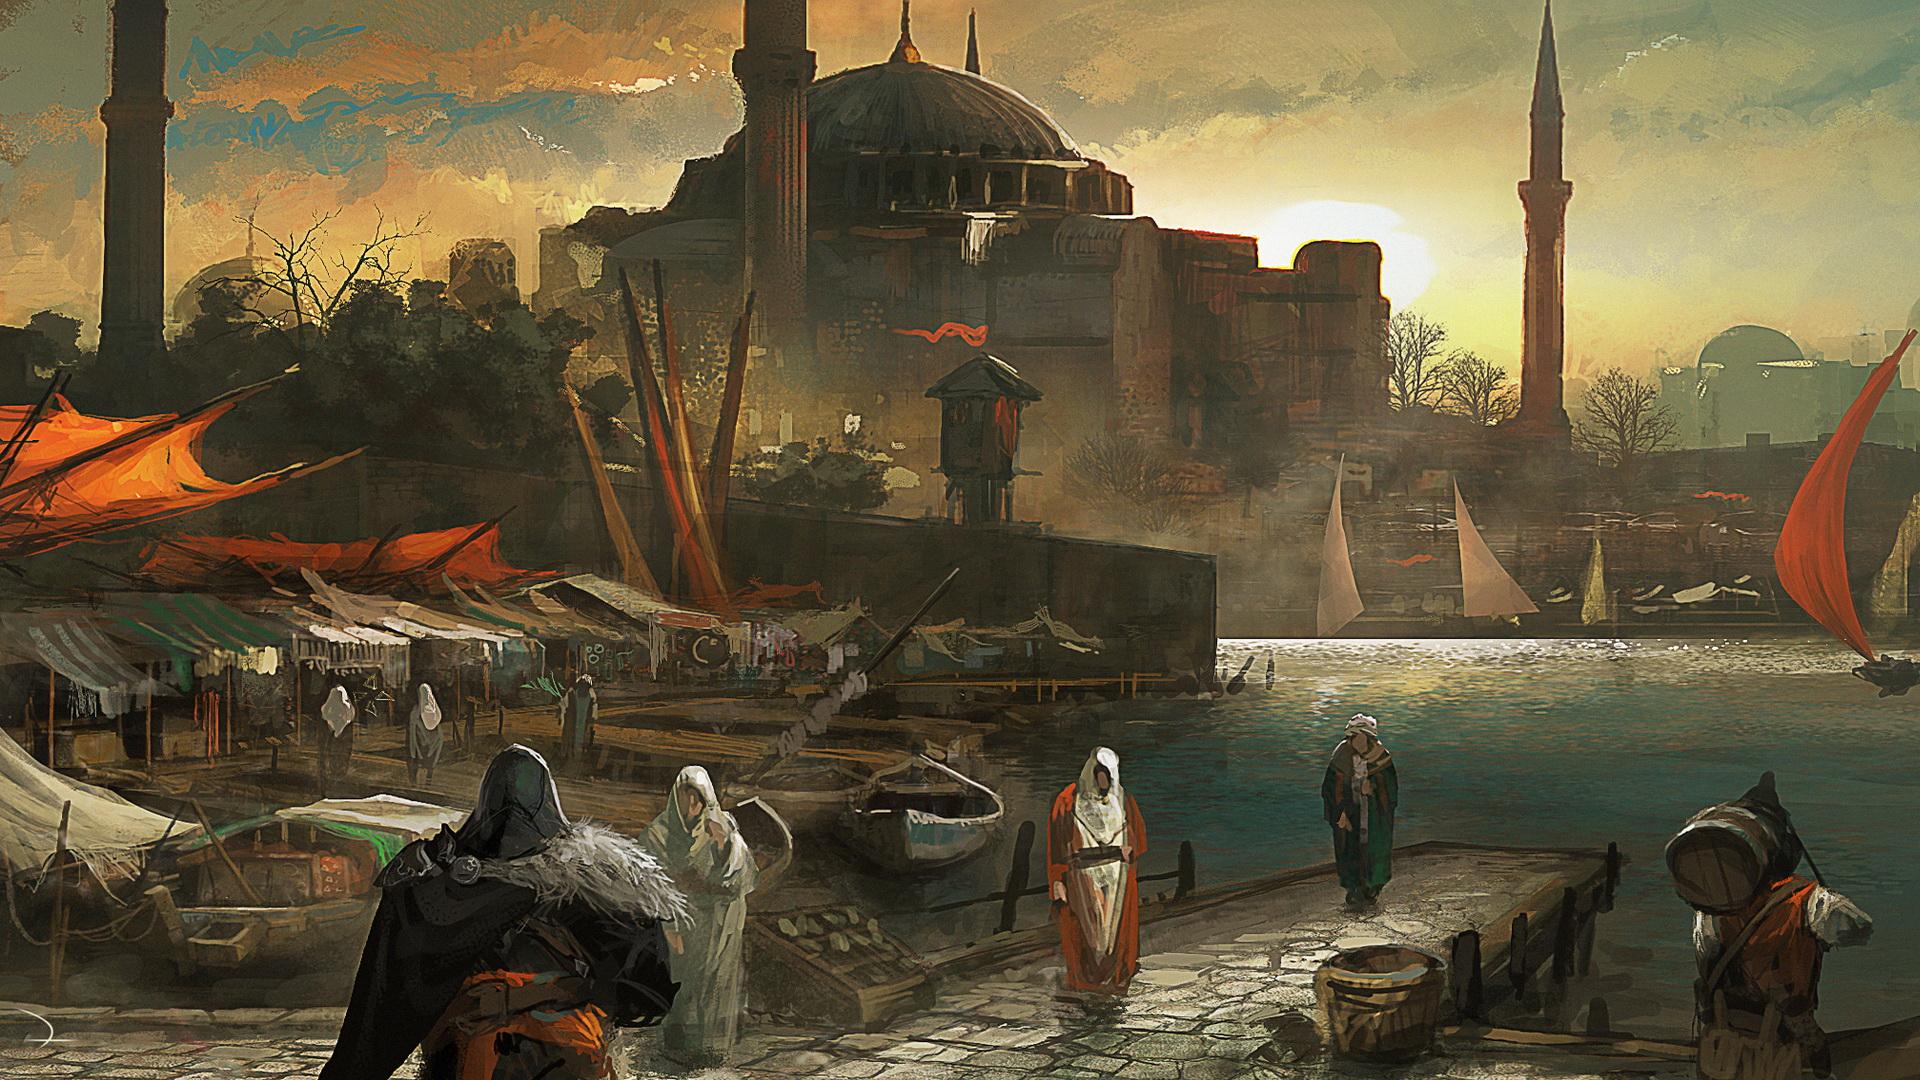 assassins creed revelations art docks Wallpaper Game HD Wallpapers 1920x1080